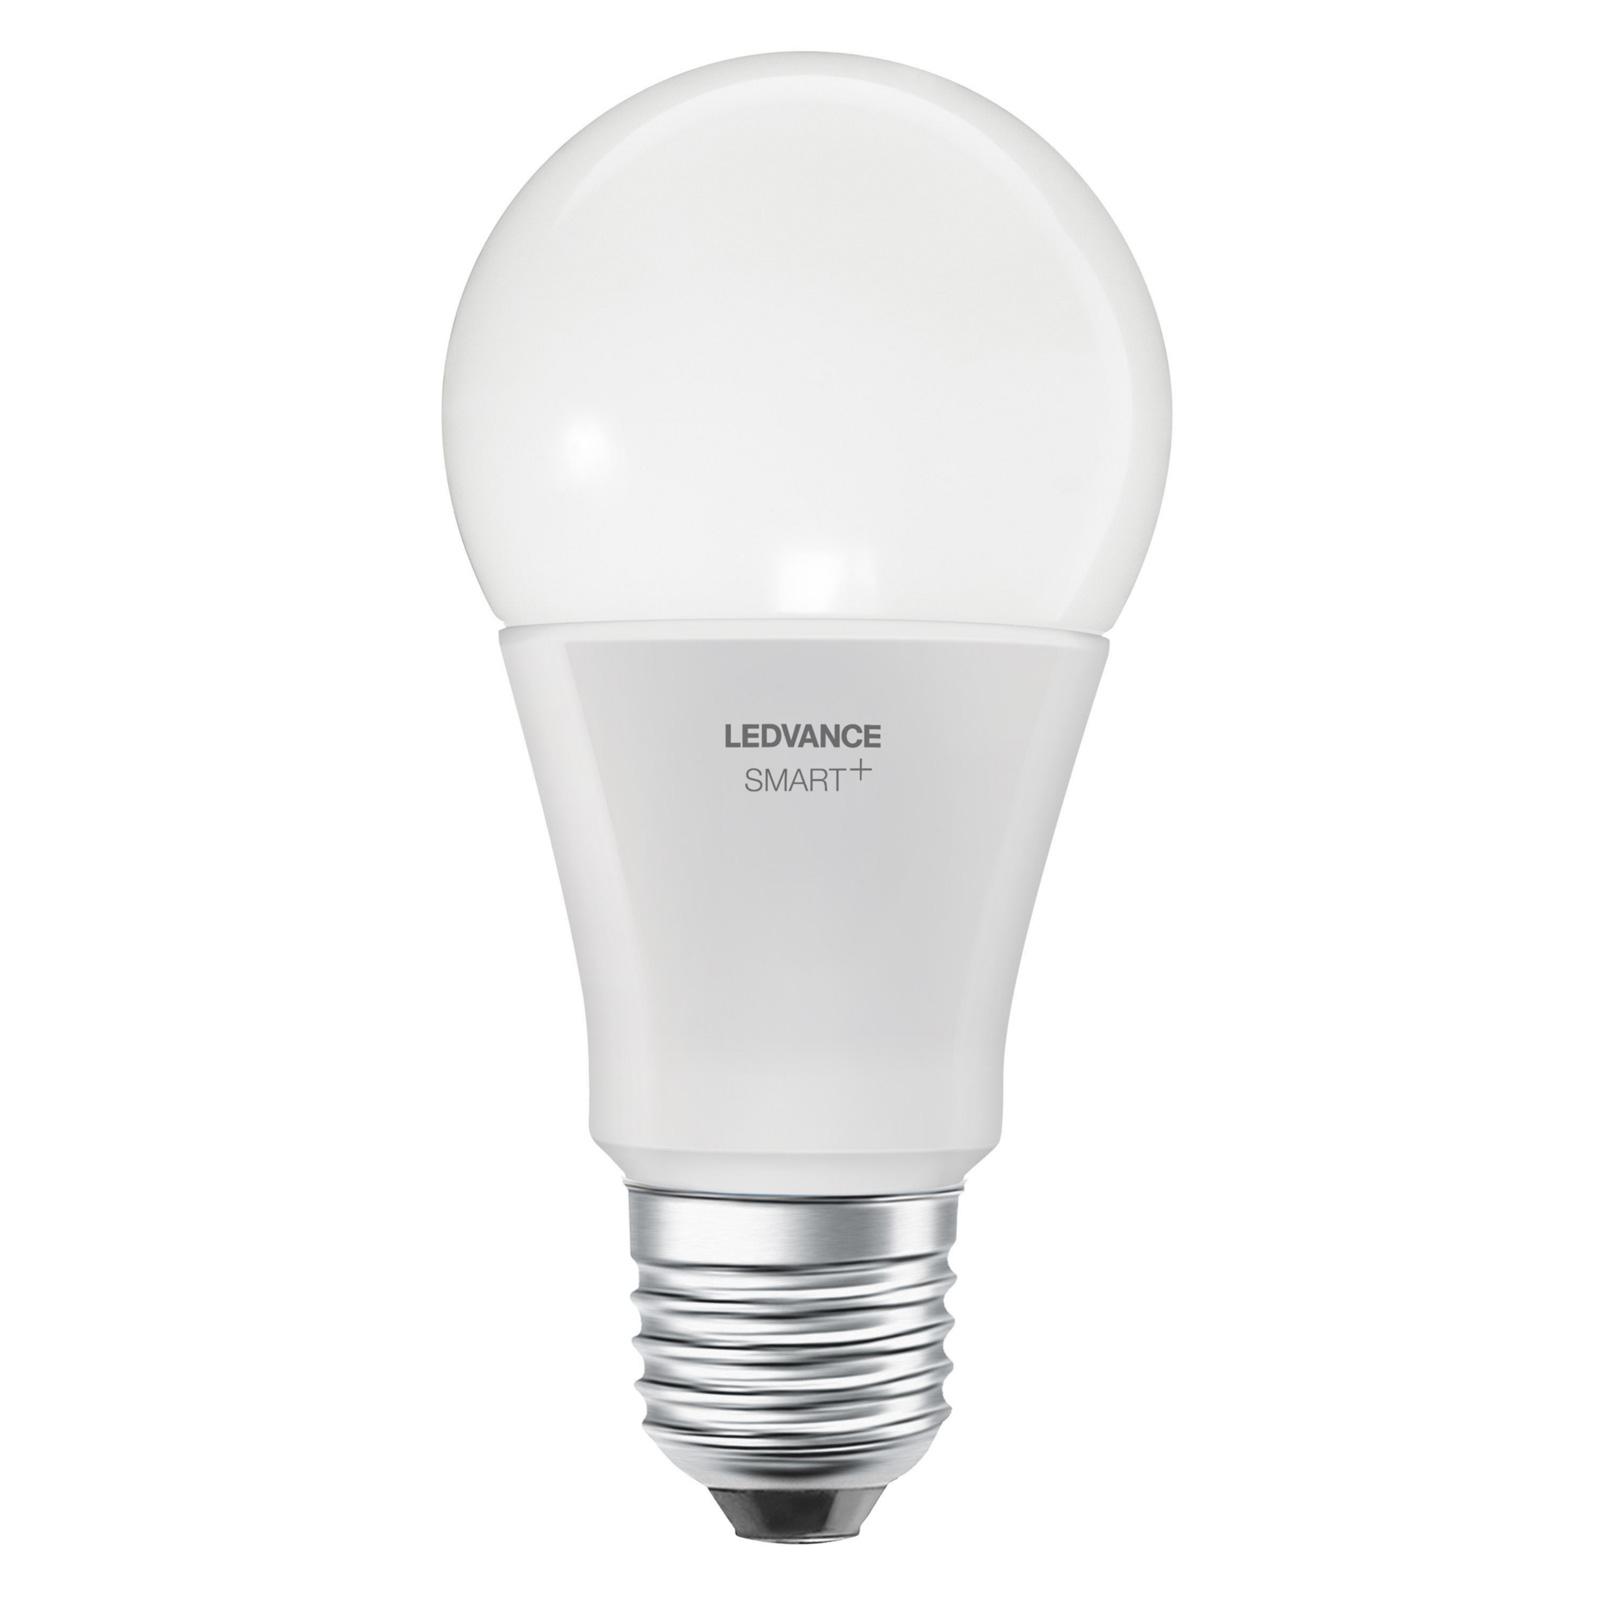 LEDVANCE SMART+ ZigBee E27 8,5W Classic 2700-6500K